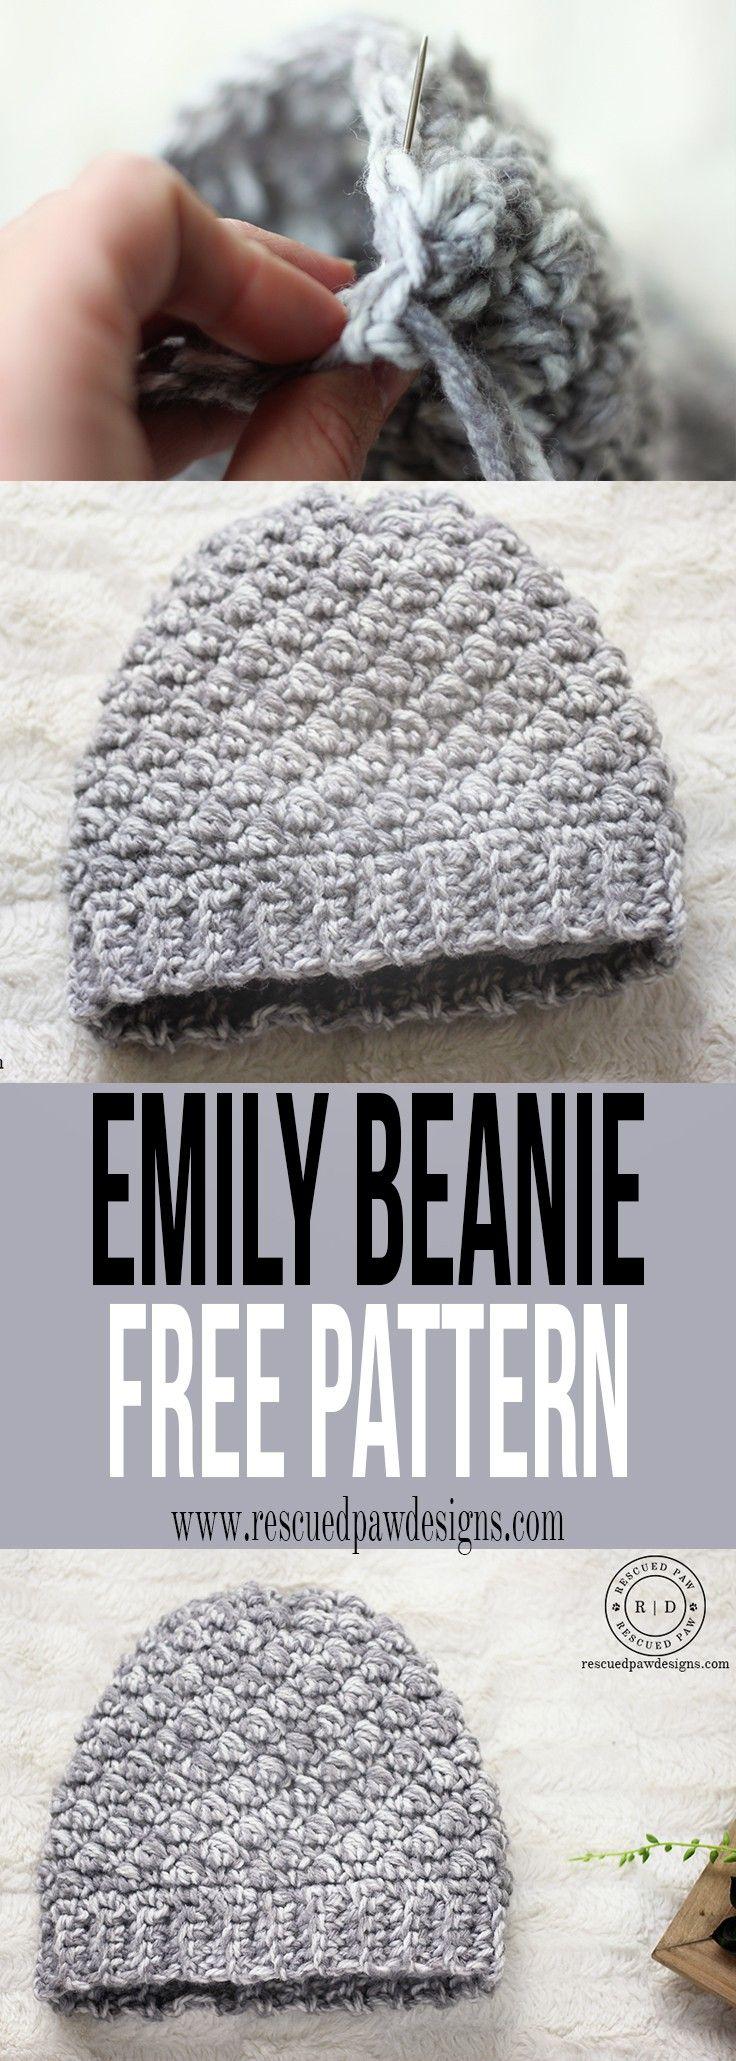 Emily Diagonal FREE Beanie Crochet Pattern | Pinterest | Crochet ...